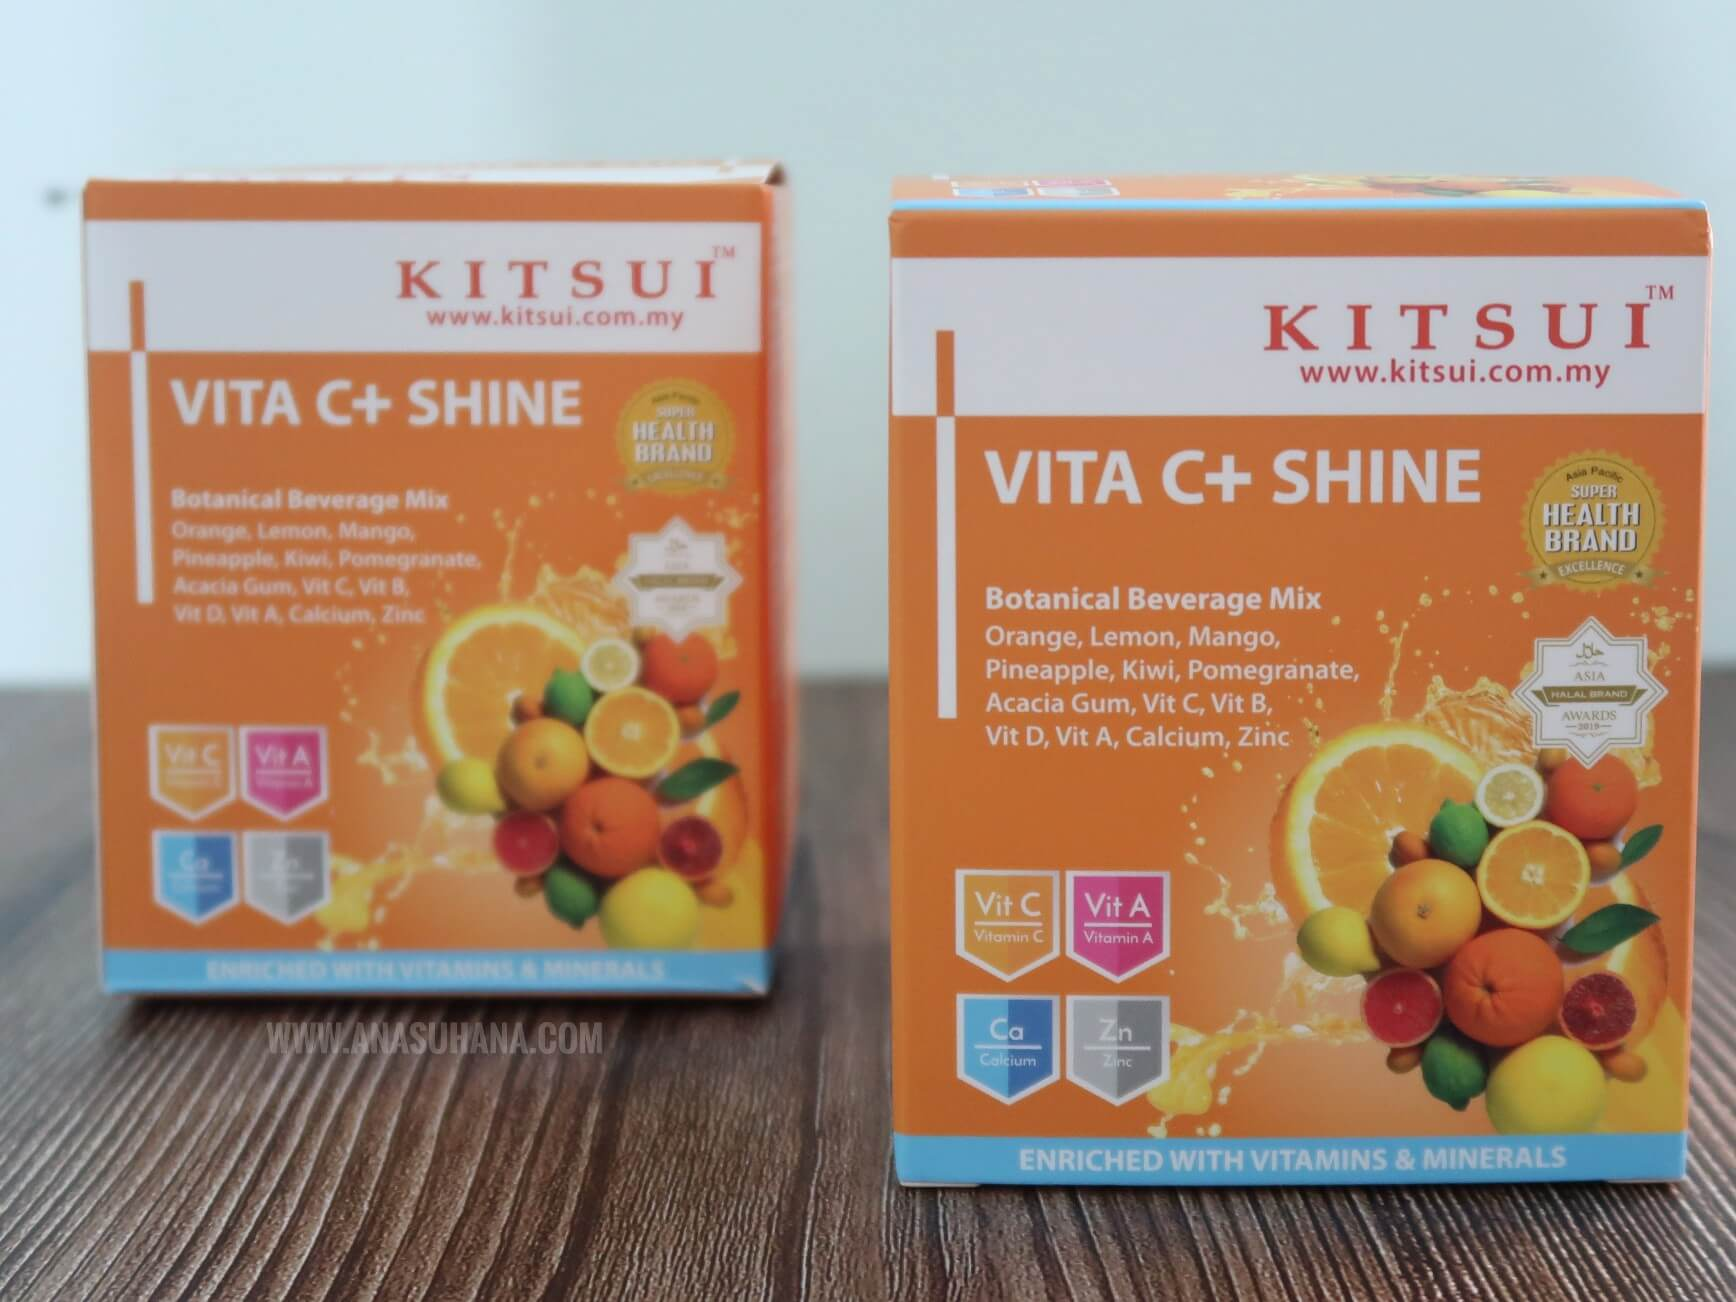 Kitsui Vita C+ Shine Bantu Tingkatkan Sistem Imunisasi Badan